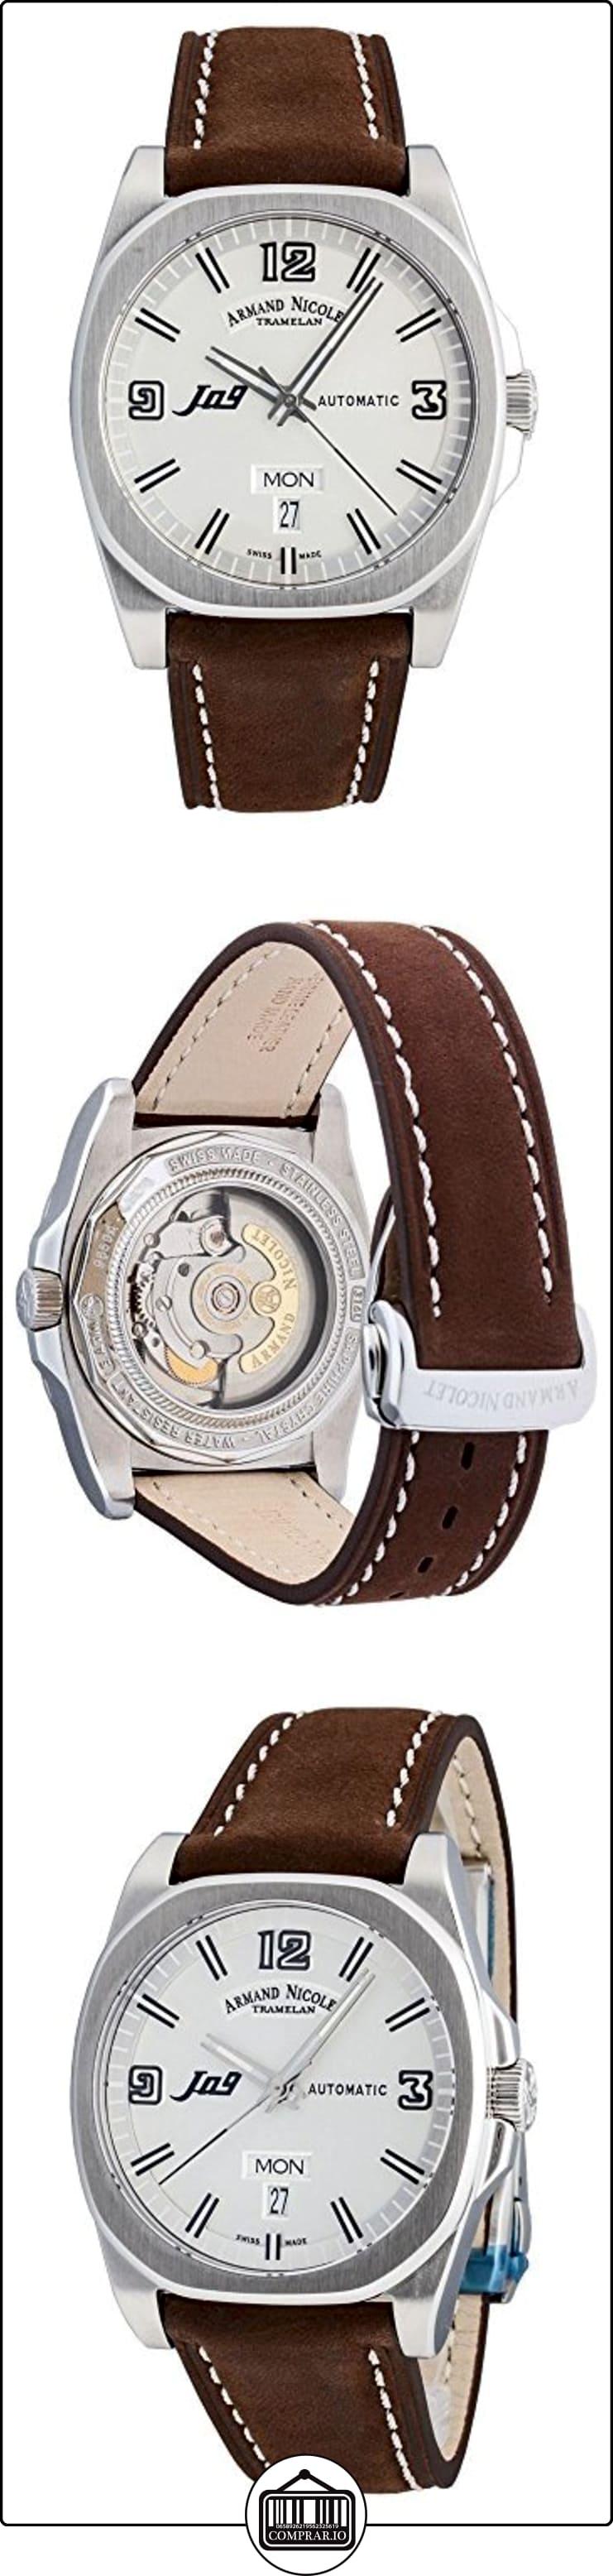 Armand Nicolet J09Day & DATE Automatic 9650A de Ag de p865mr2 de  ✿ Relojes para hombre - (Lujo) ✿